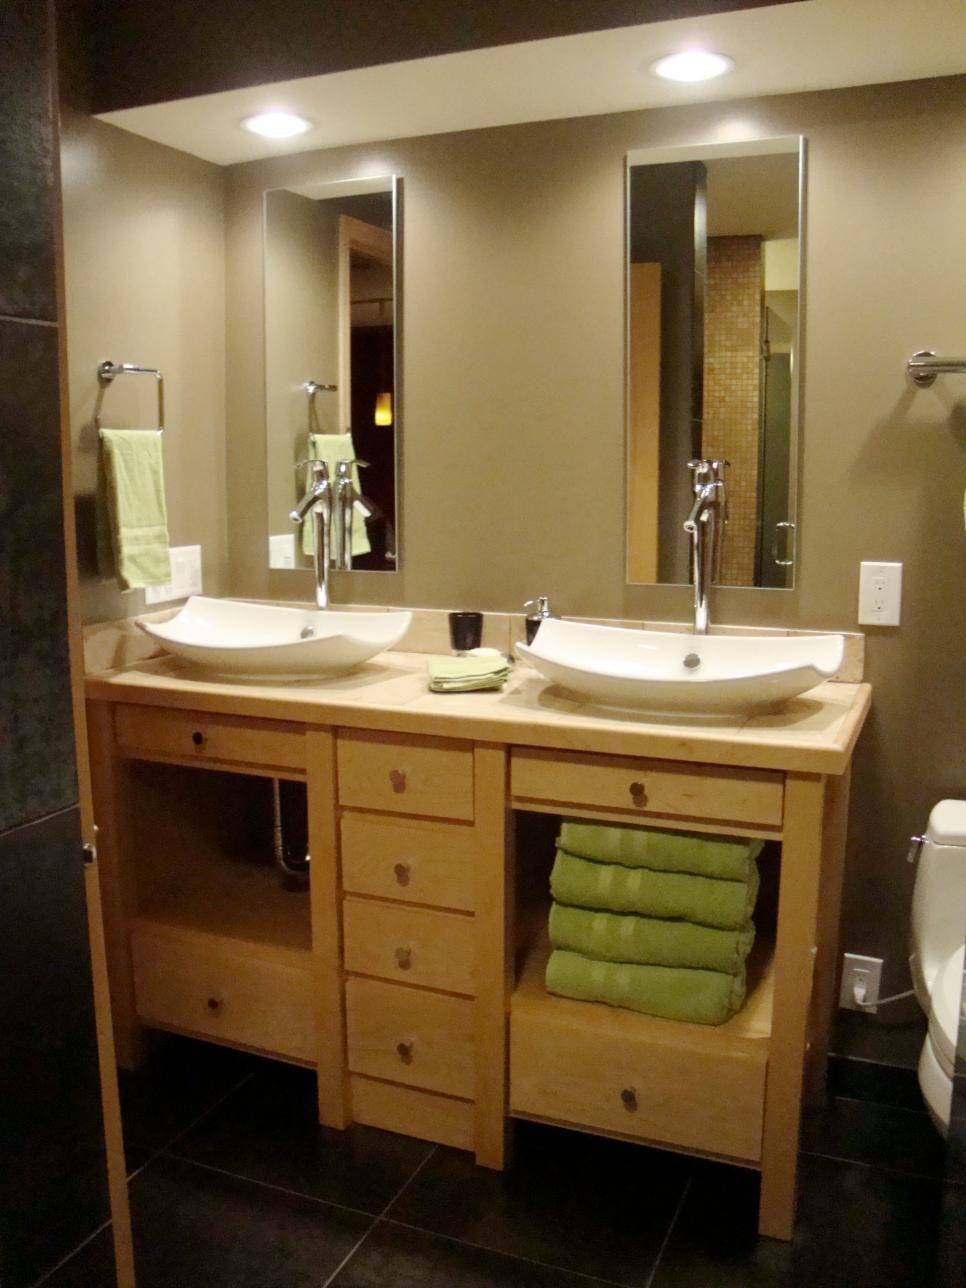 Beautiful Images Of Bathroom Sinks and Vanities Best Bath